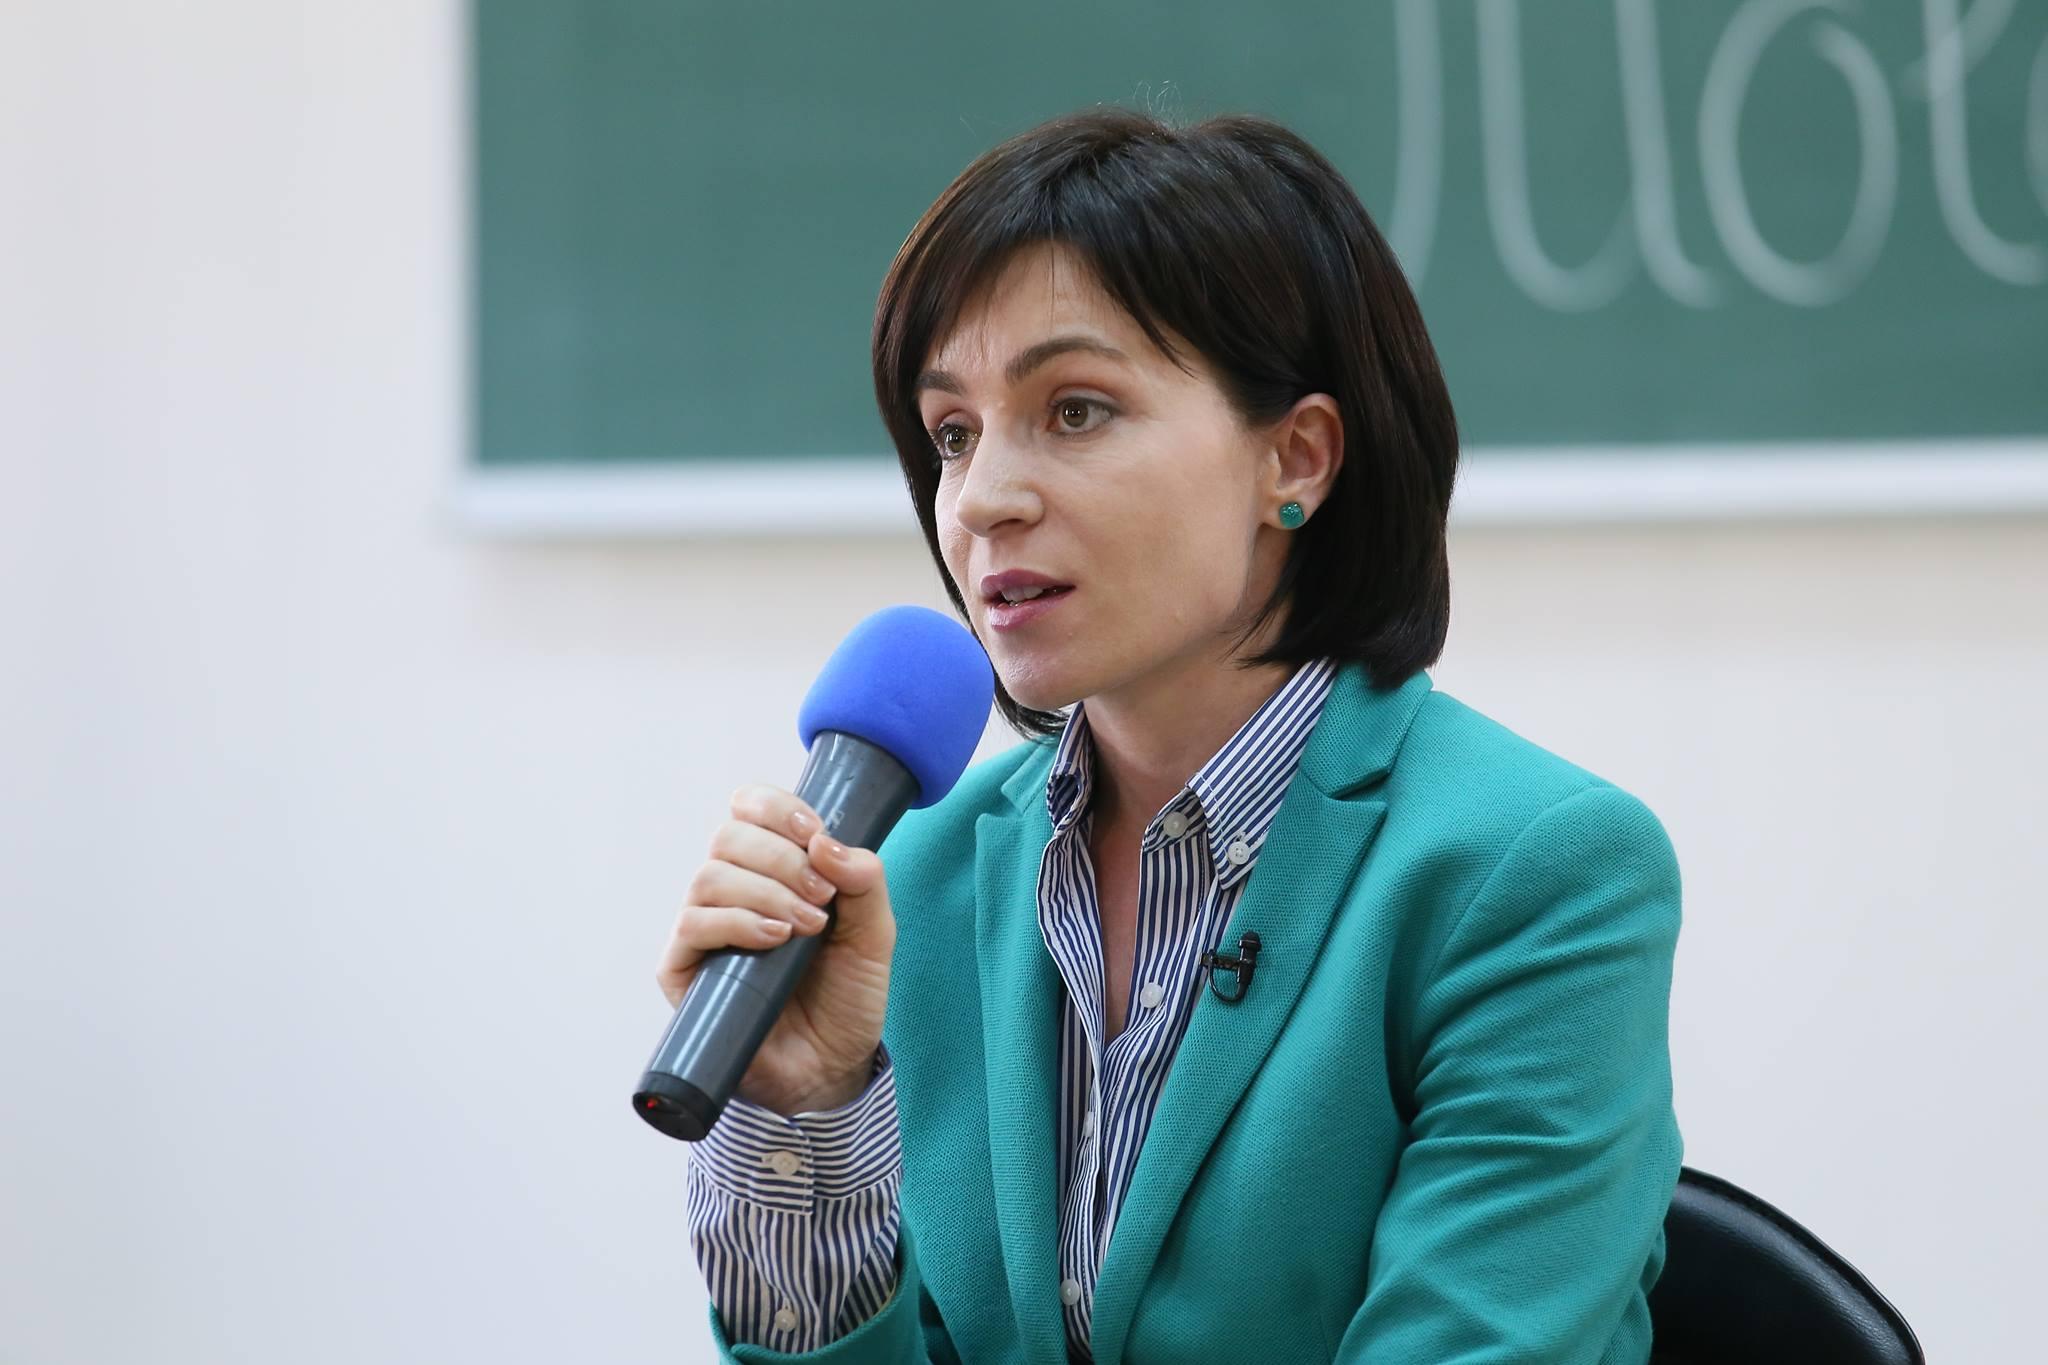 Viorica Dancila o invita pe Maia Sandu la Bucuresti: E esential sa mentineti angajamentul european